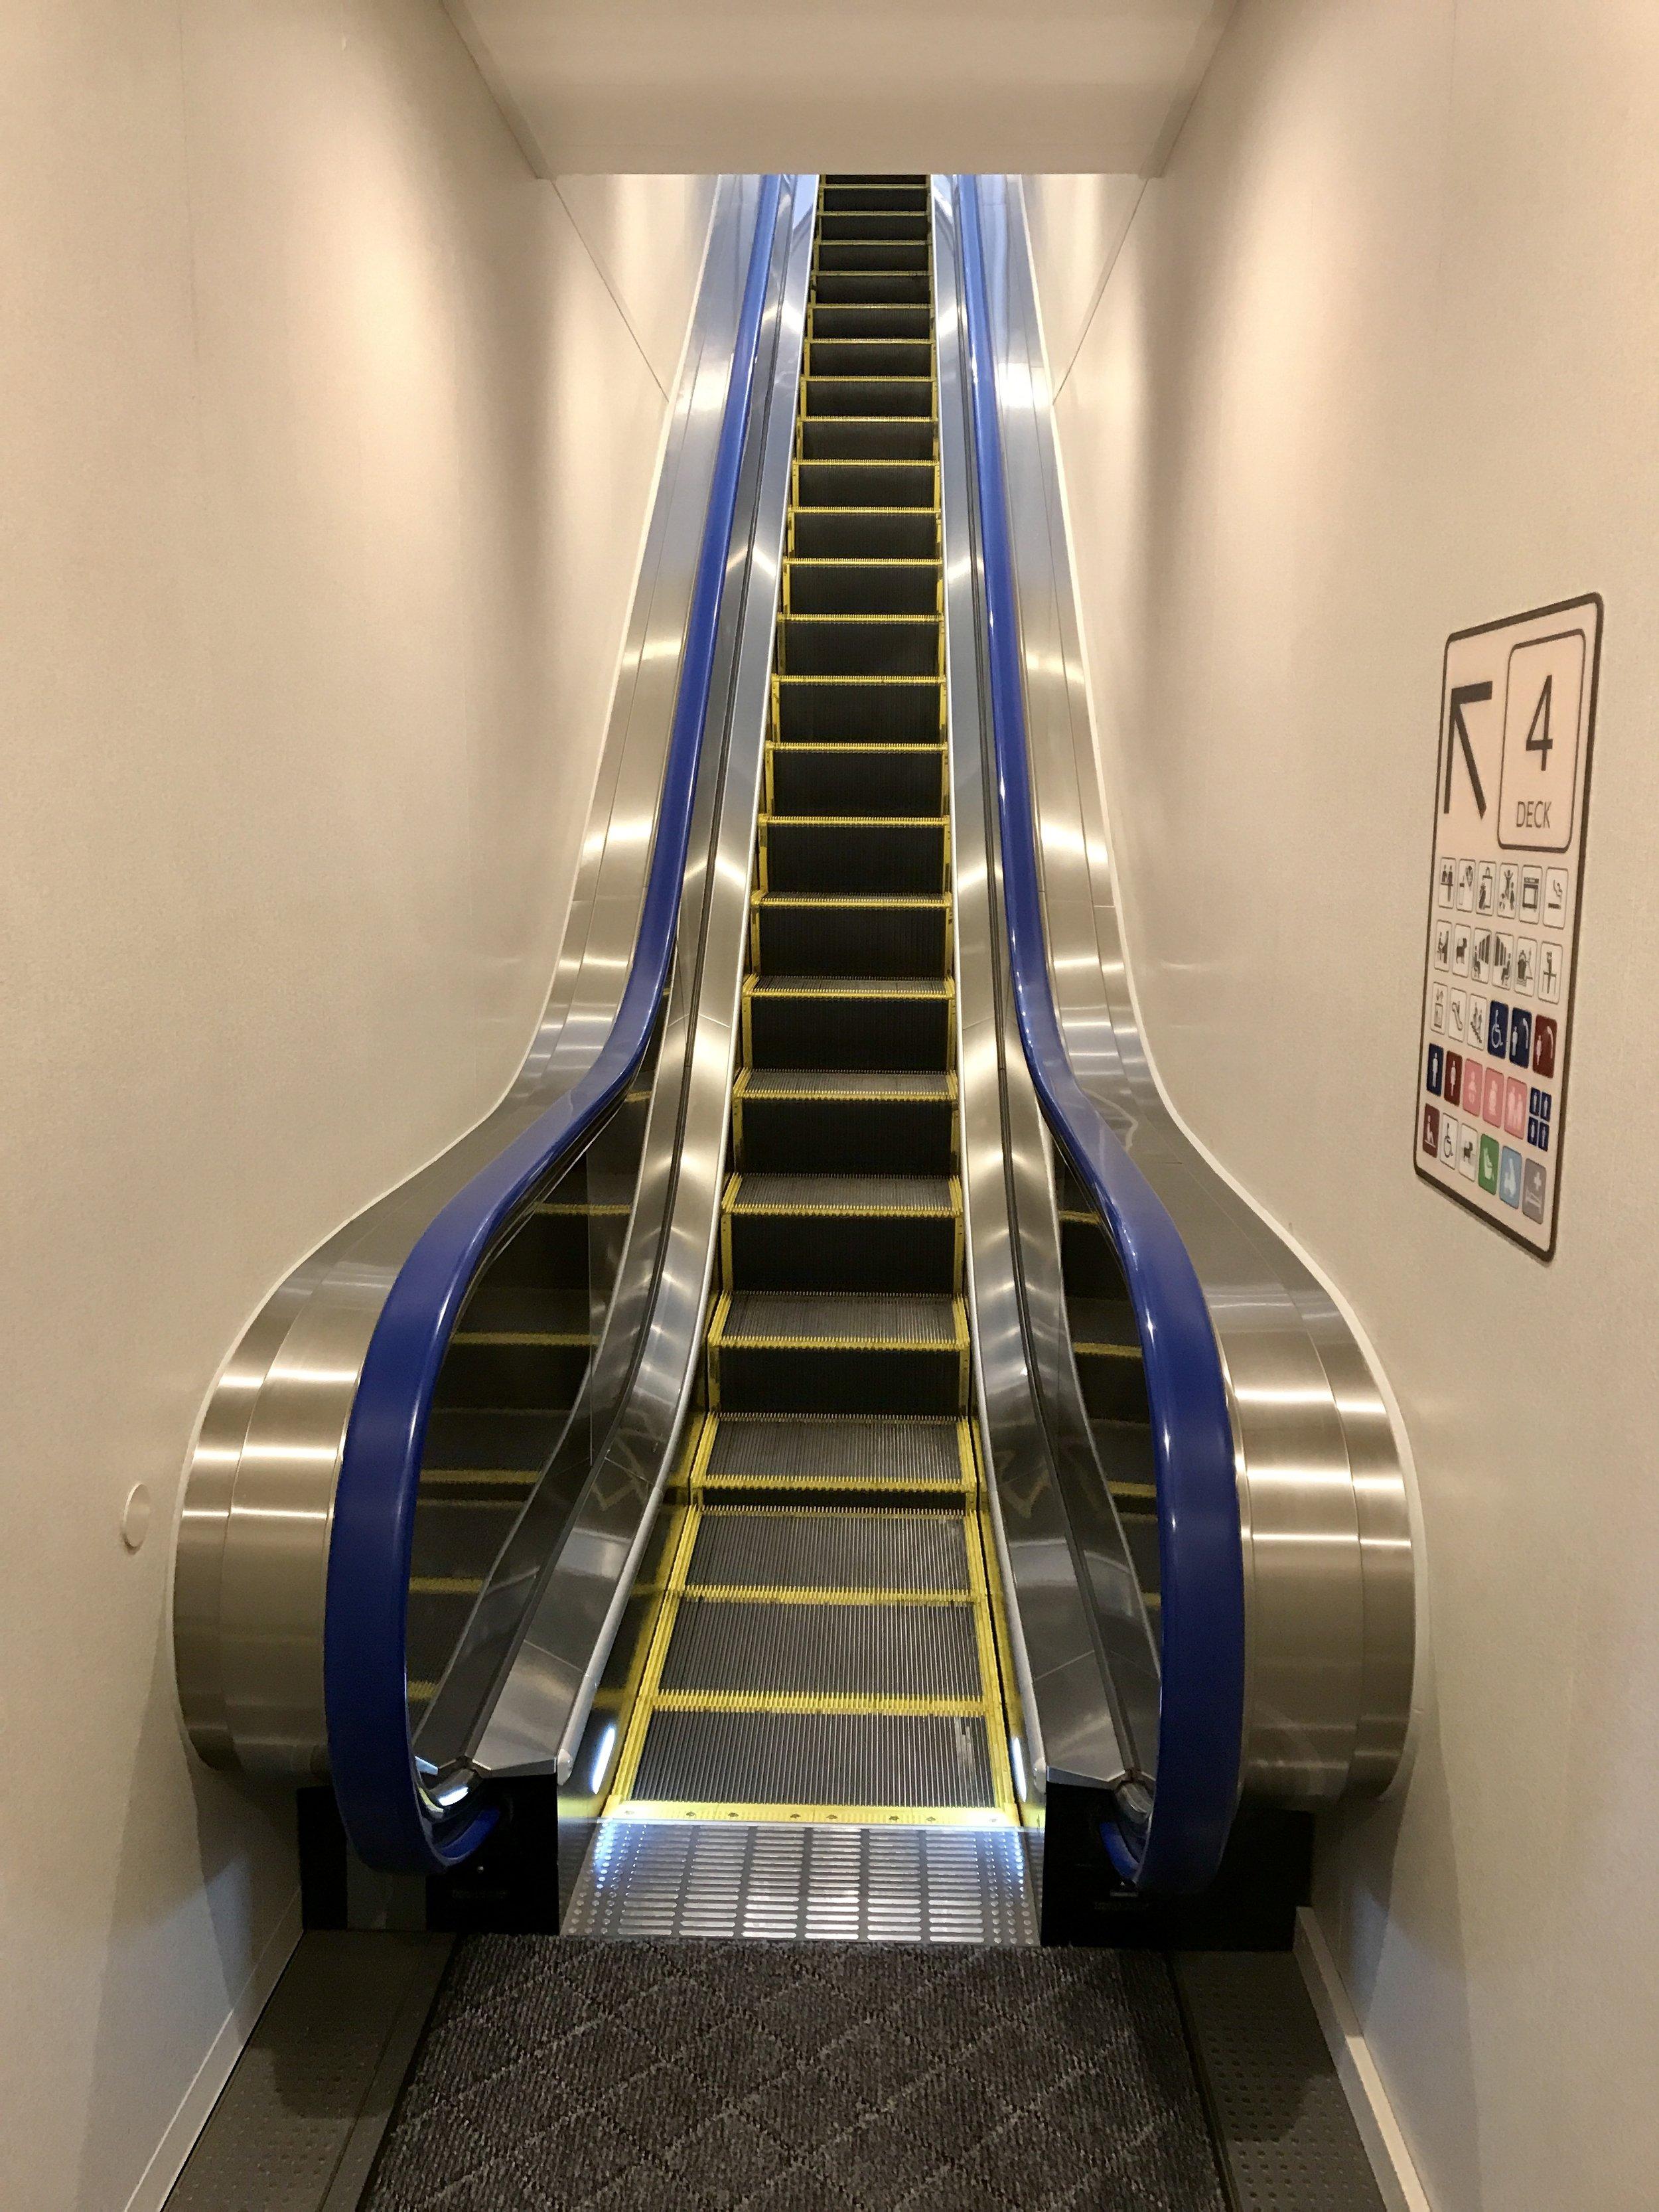 Escalators on a ferry!